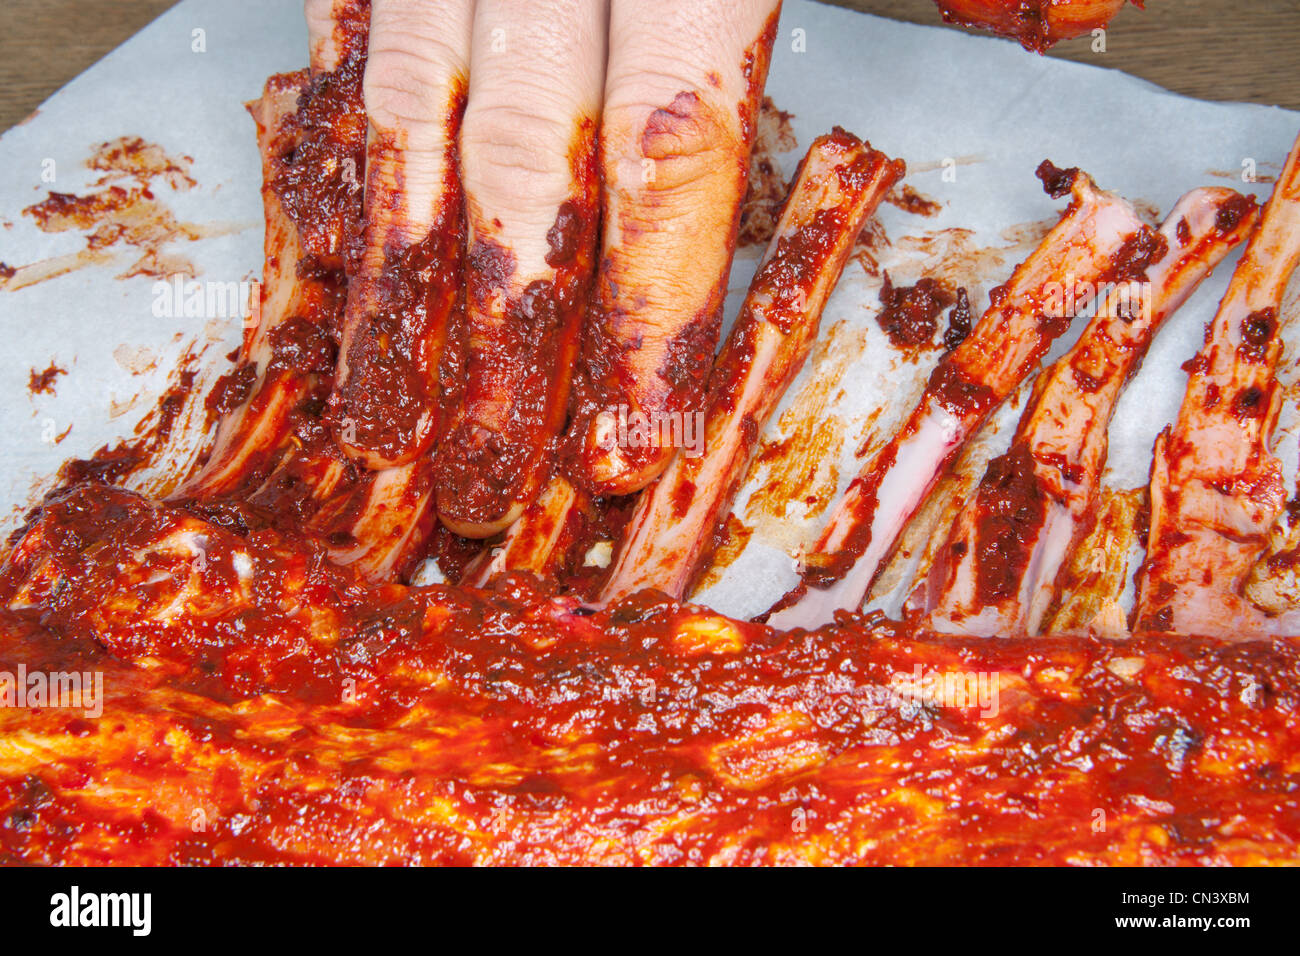 Rubbing marinade over spare ribs - Stock Image